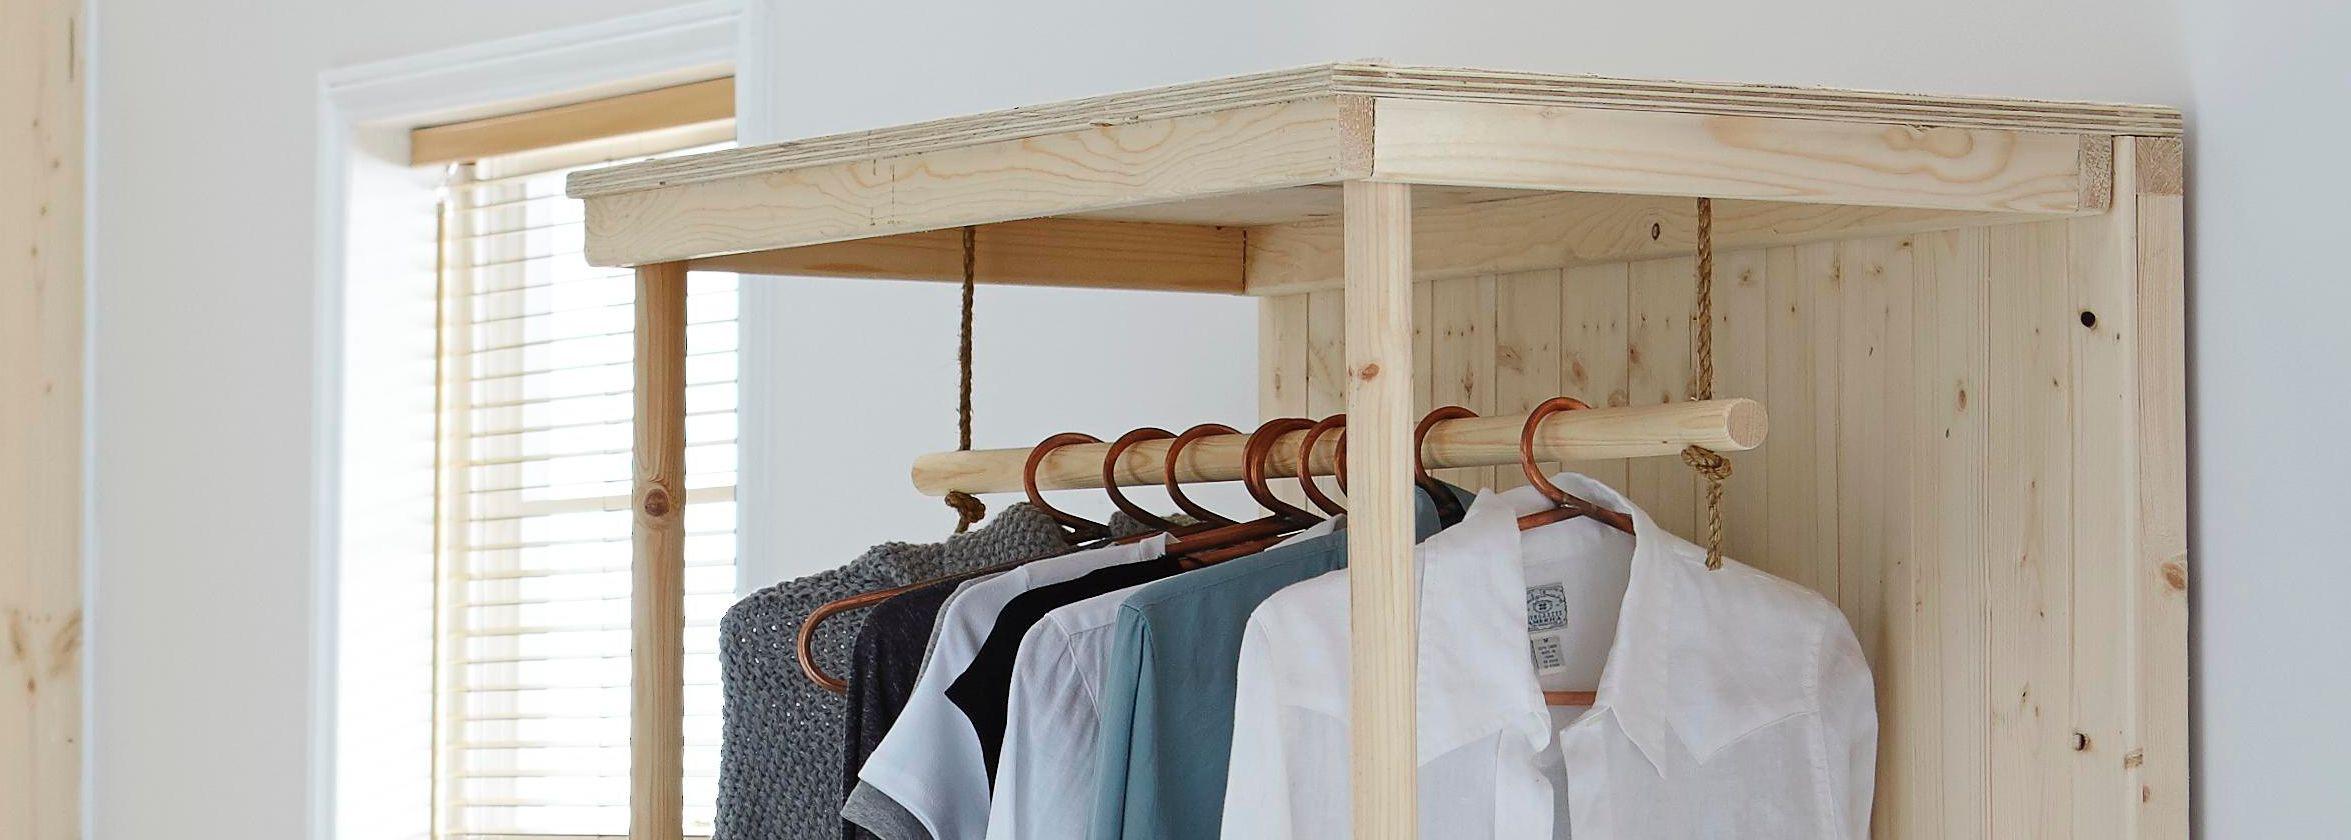 Diy Wardrobe  How to make a wardrobe Help & Ideas